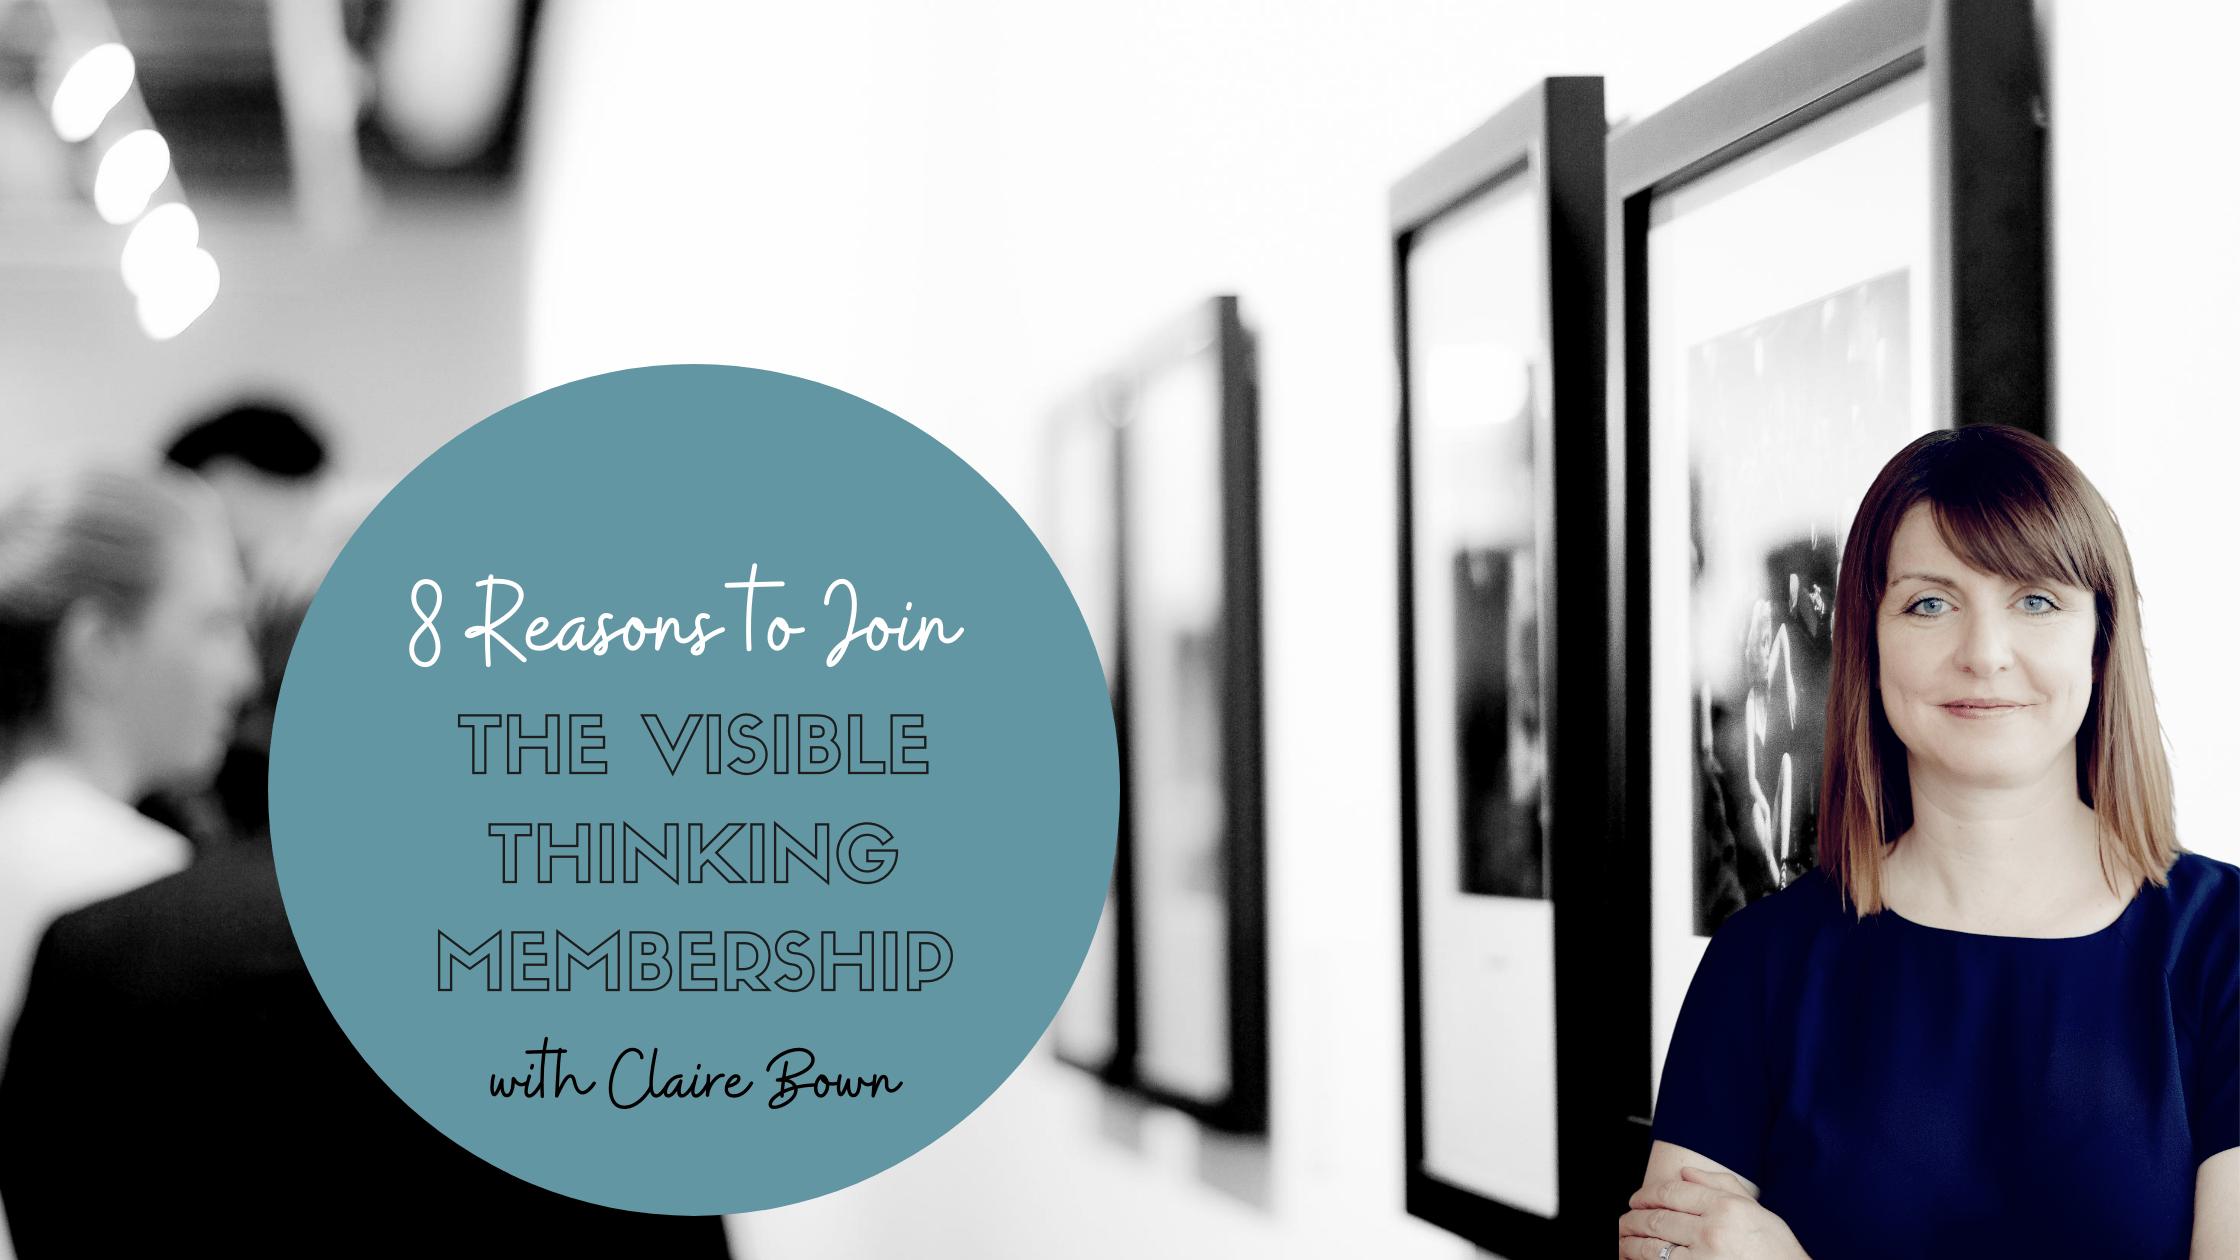 8 Reasons to Join the Visible Thinking Membership